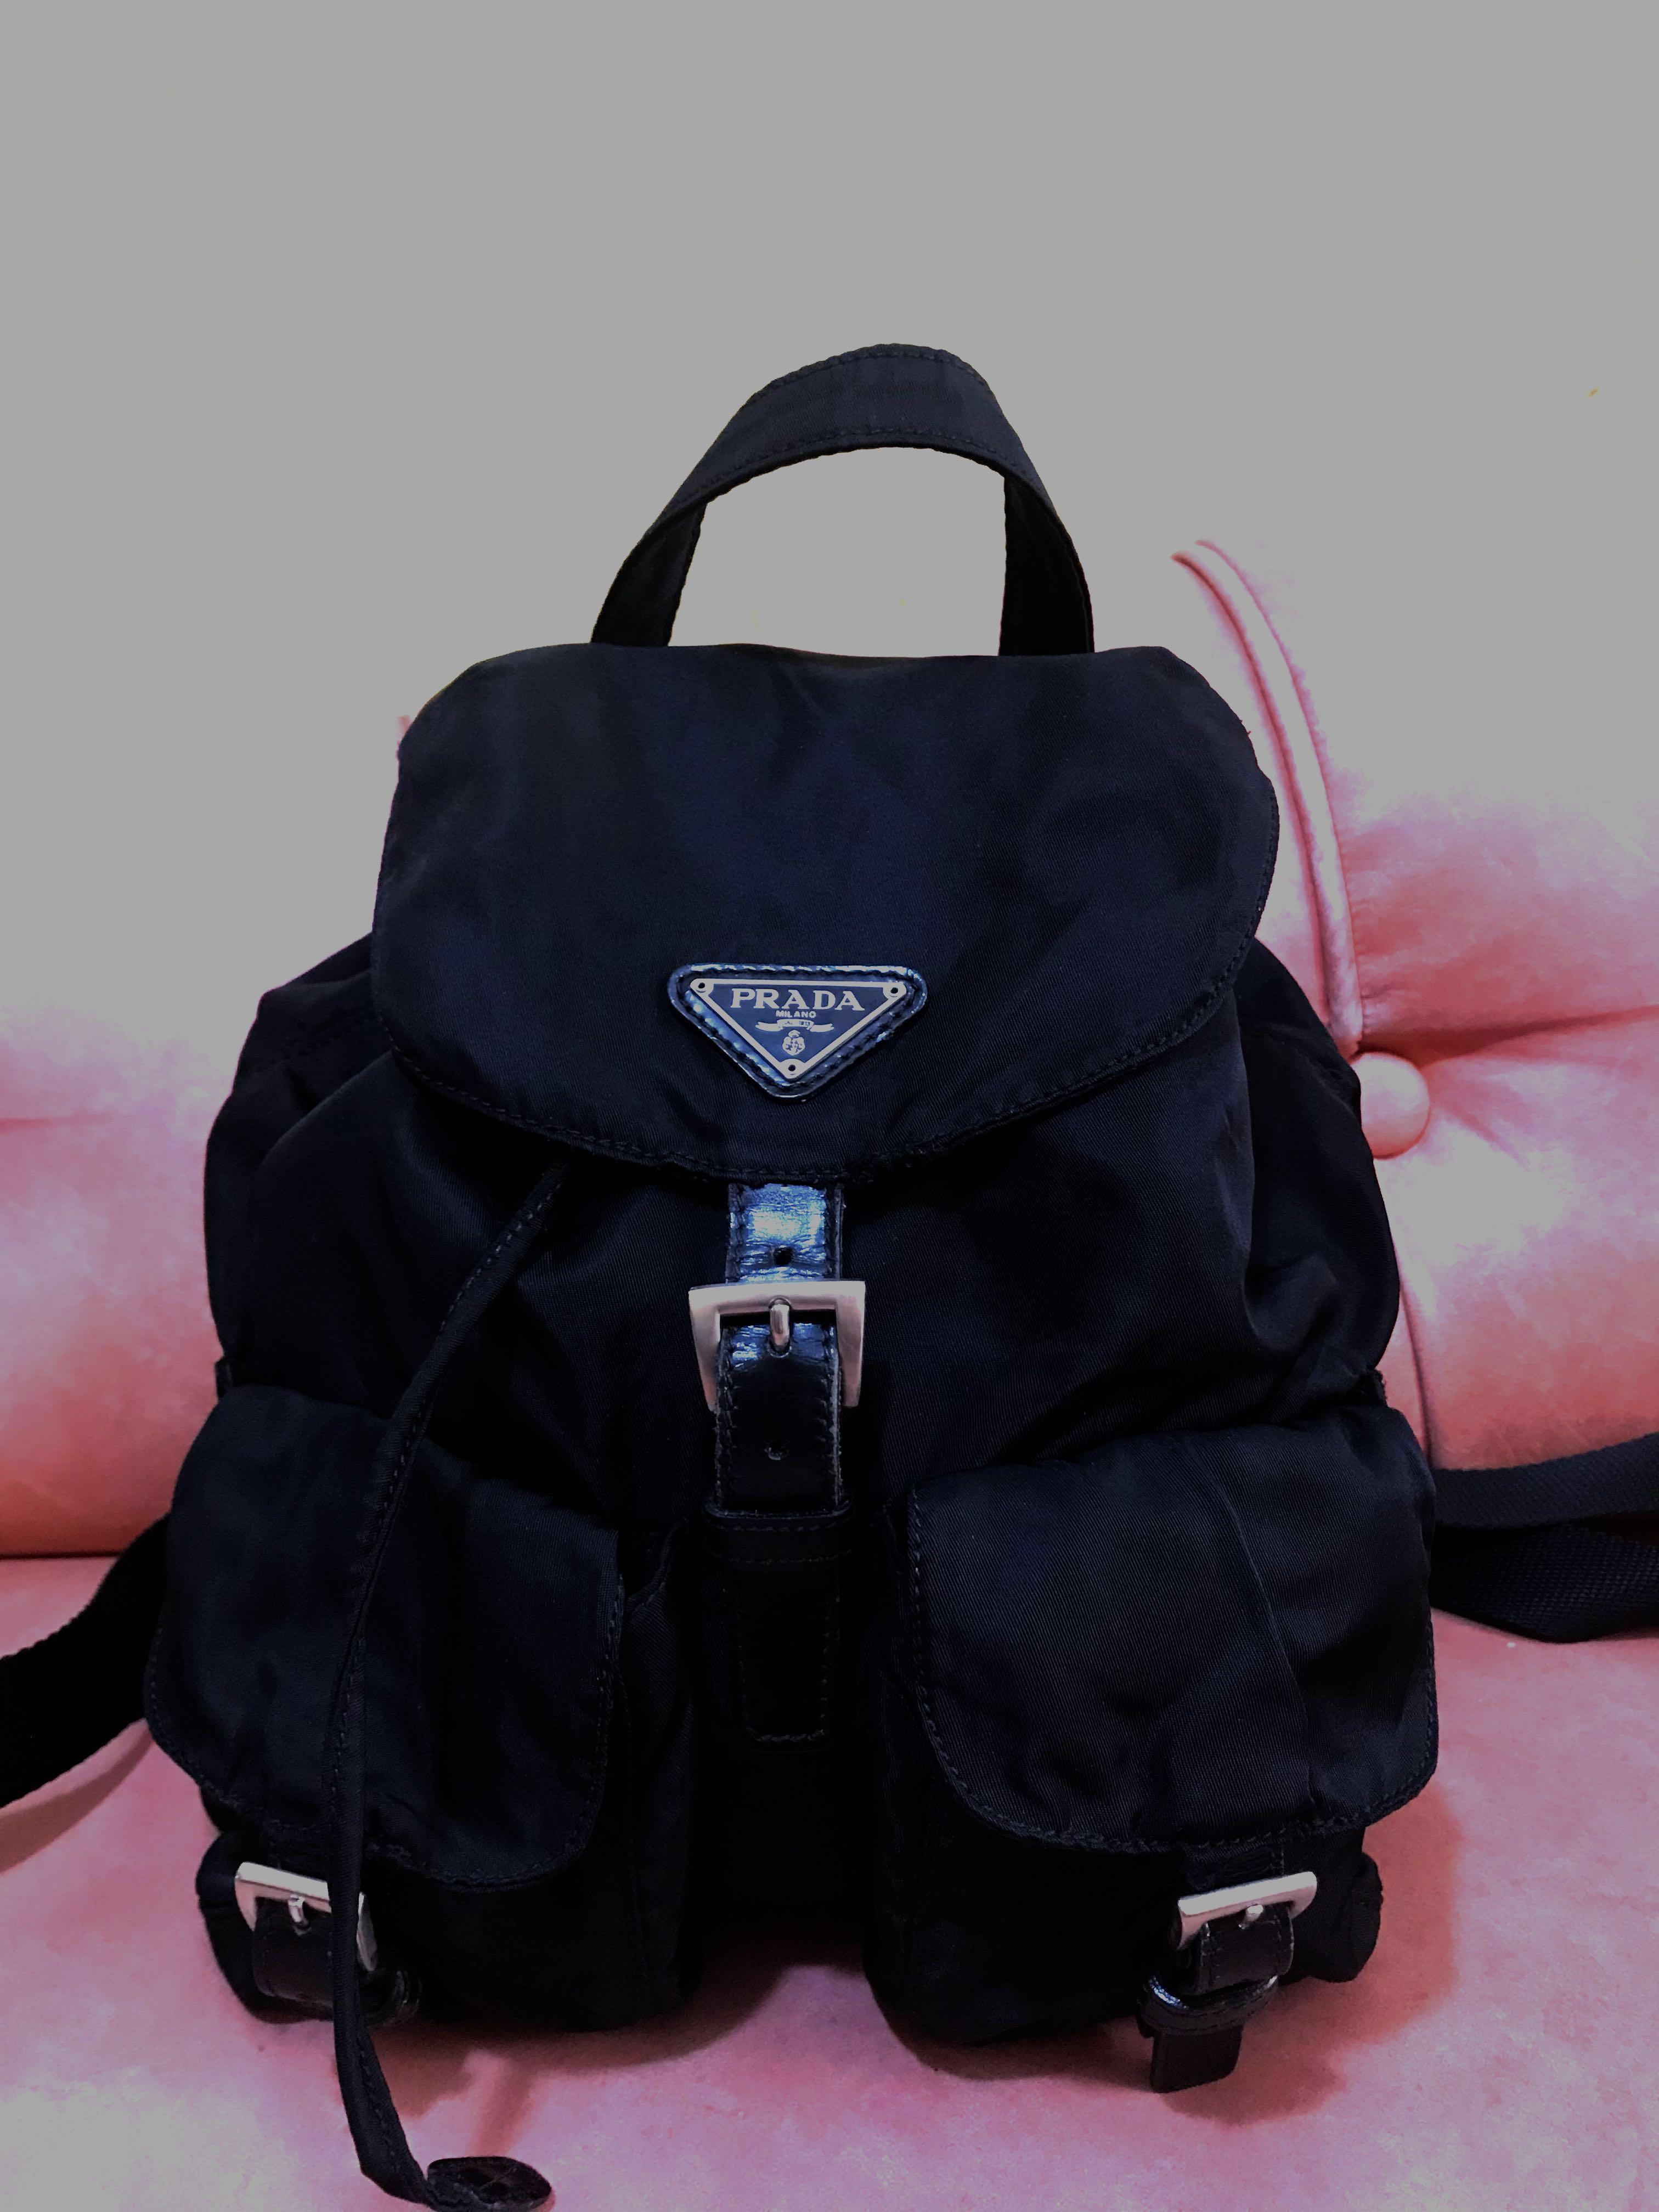 567e278a41ff Flash sale! Authentic Prada Backpack, Women's Fashion, Bags ...